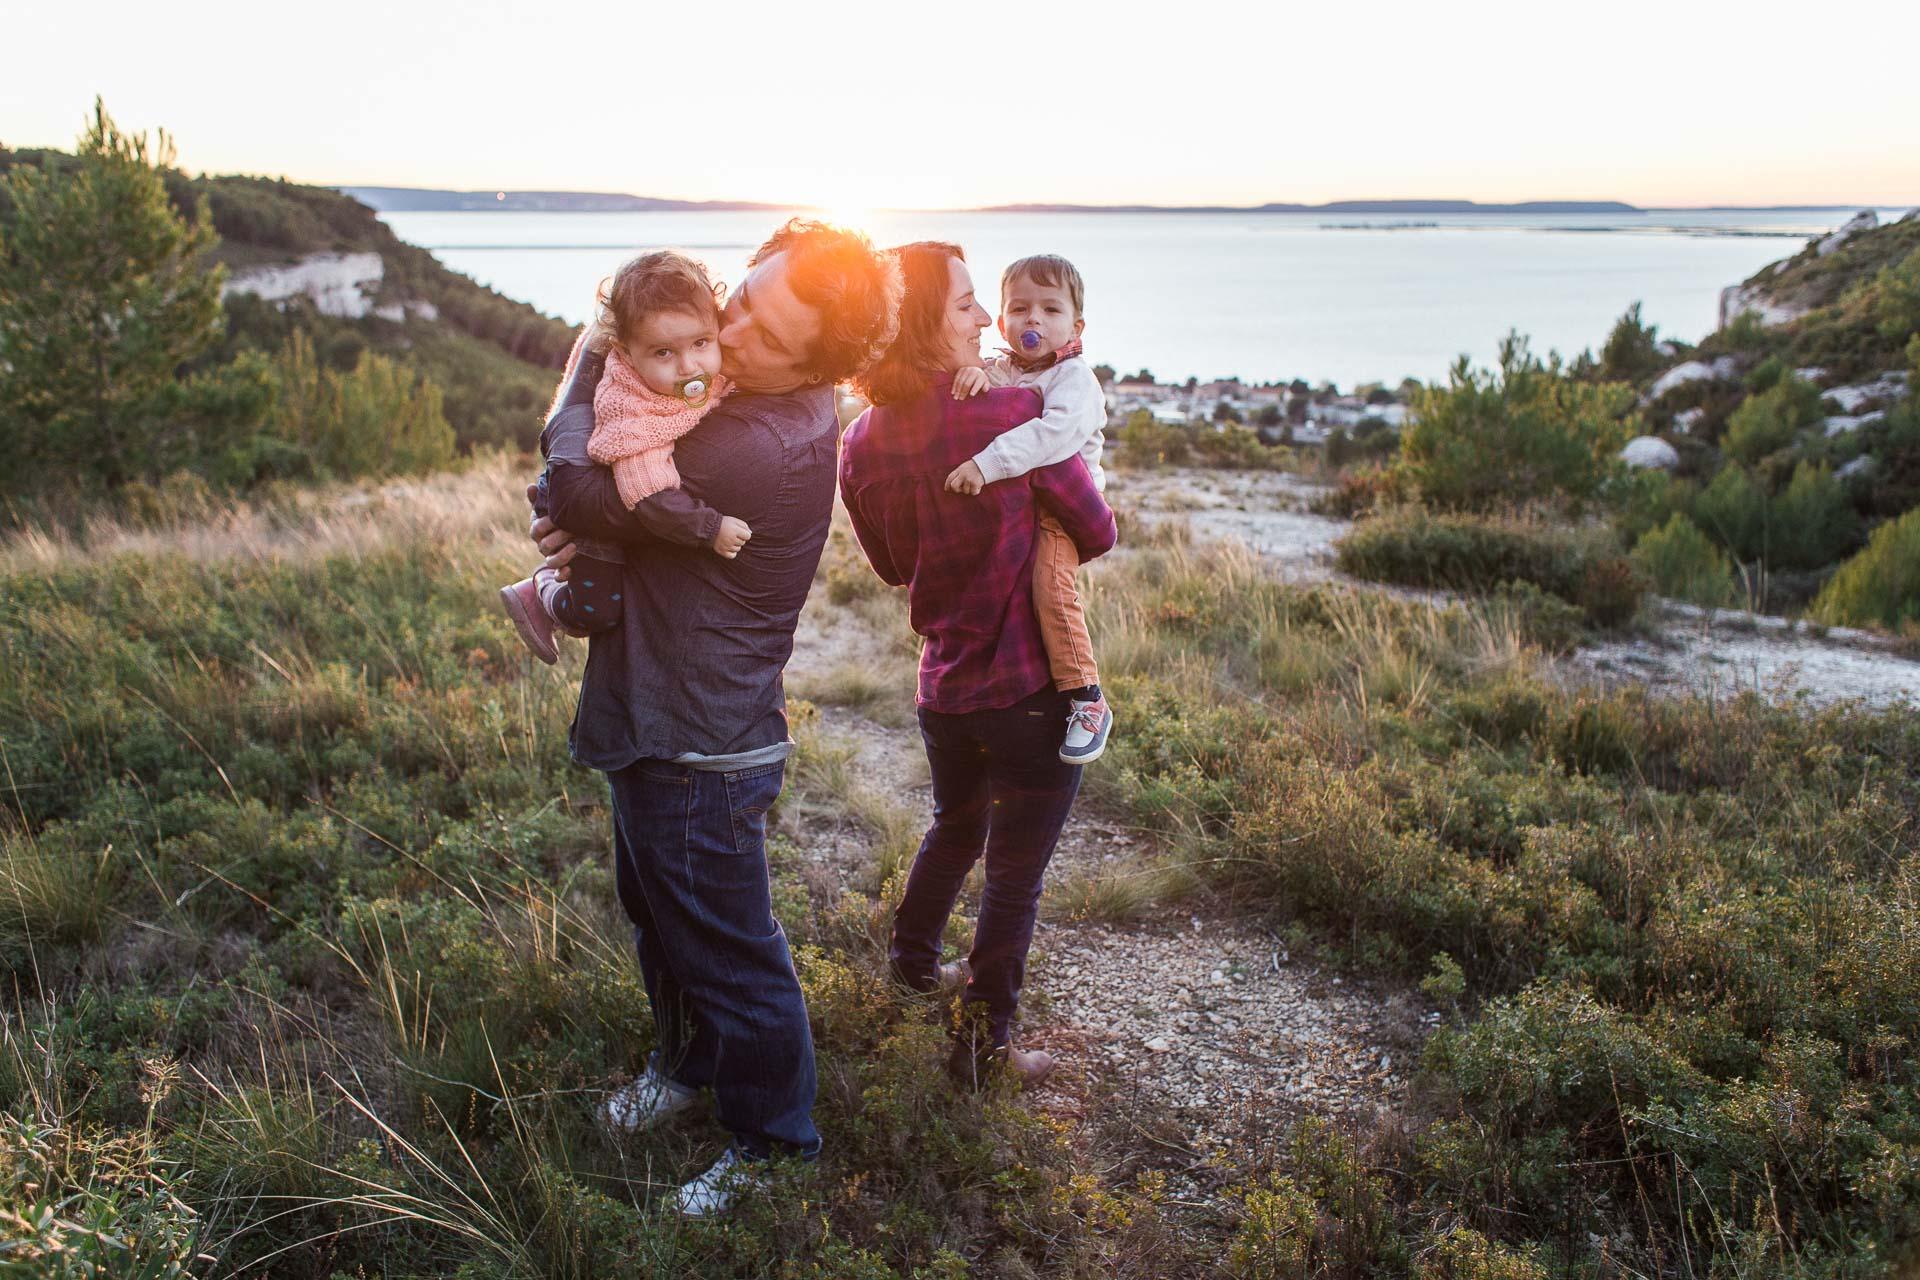 24-la famille face a la mer